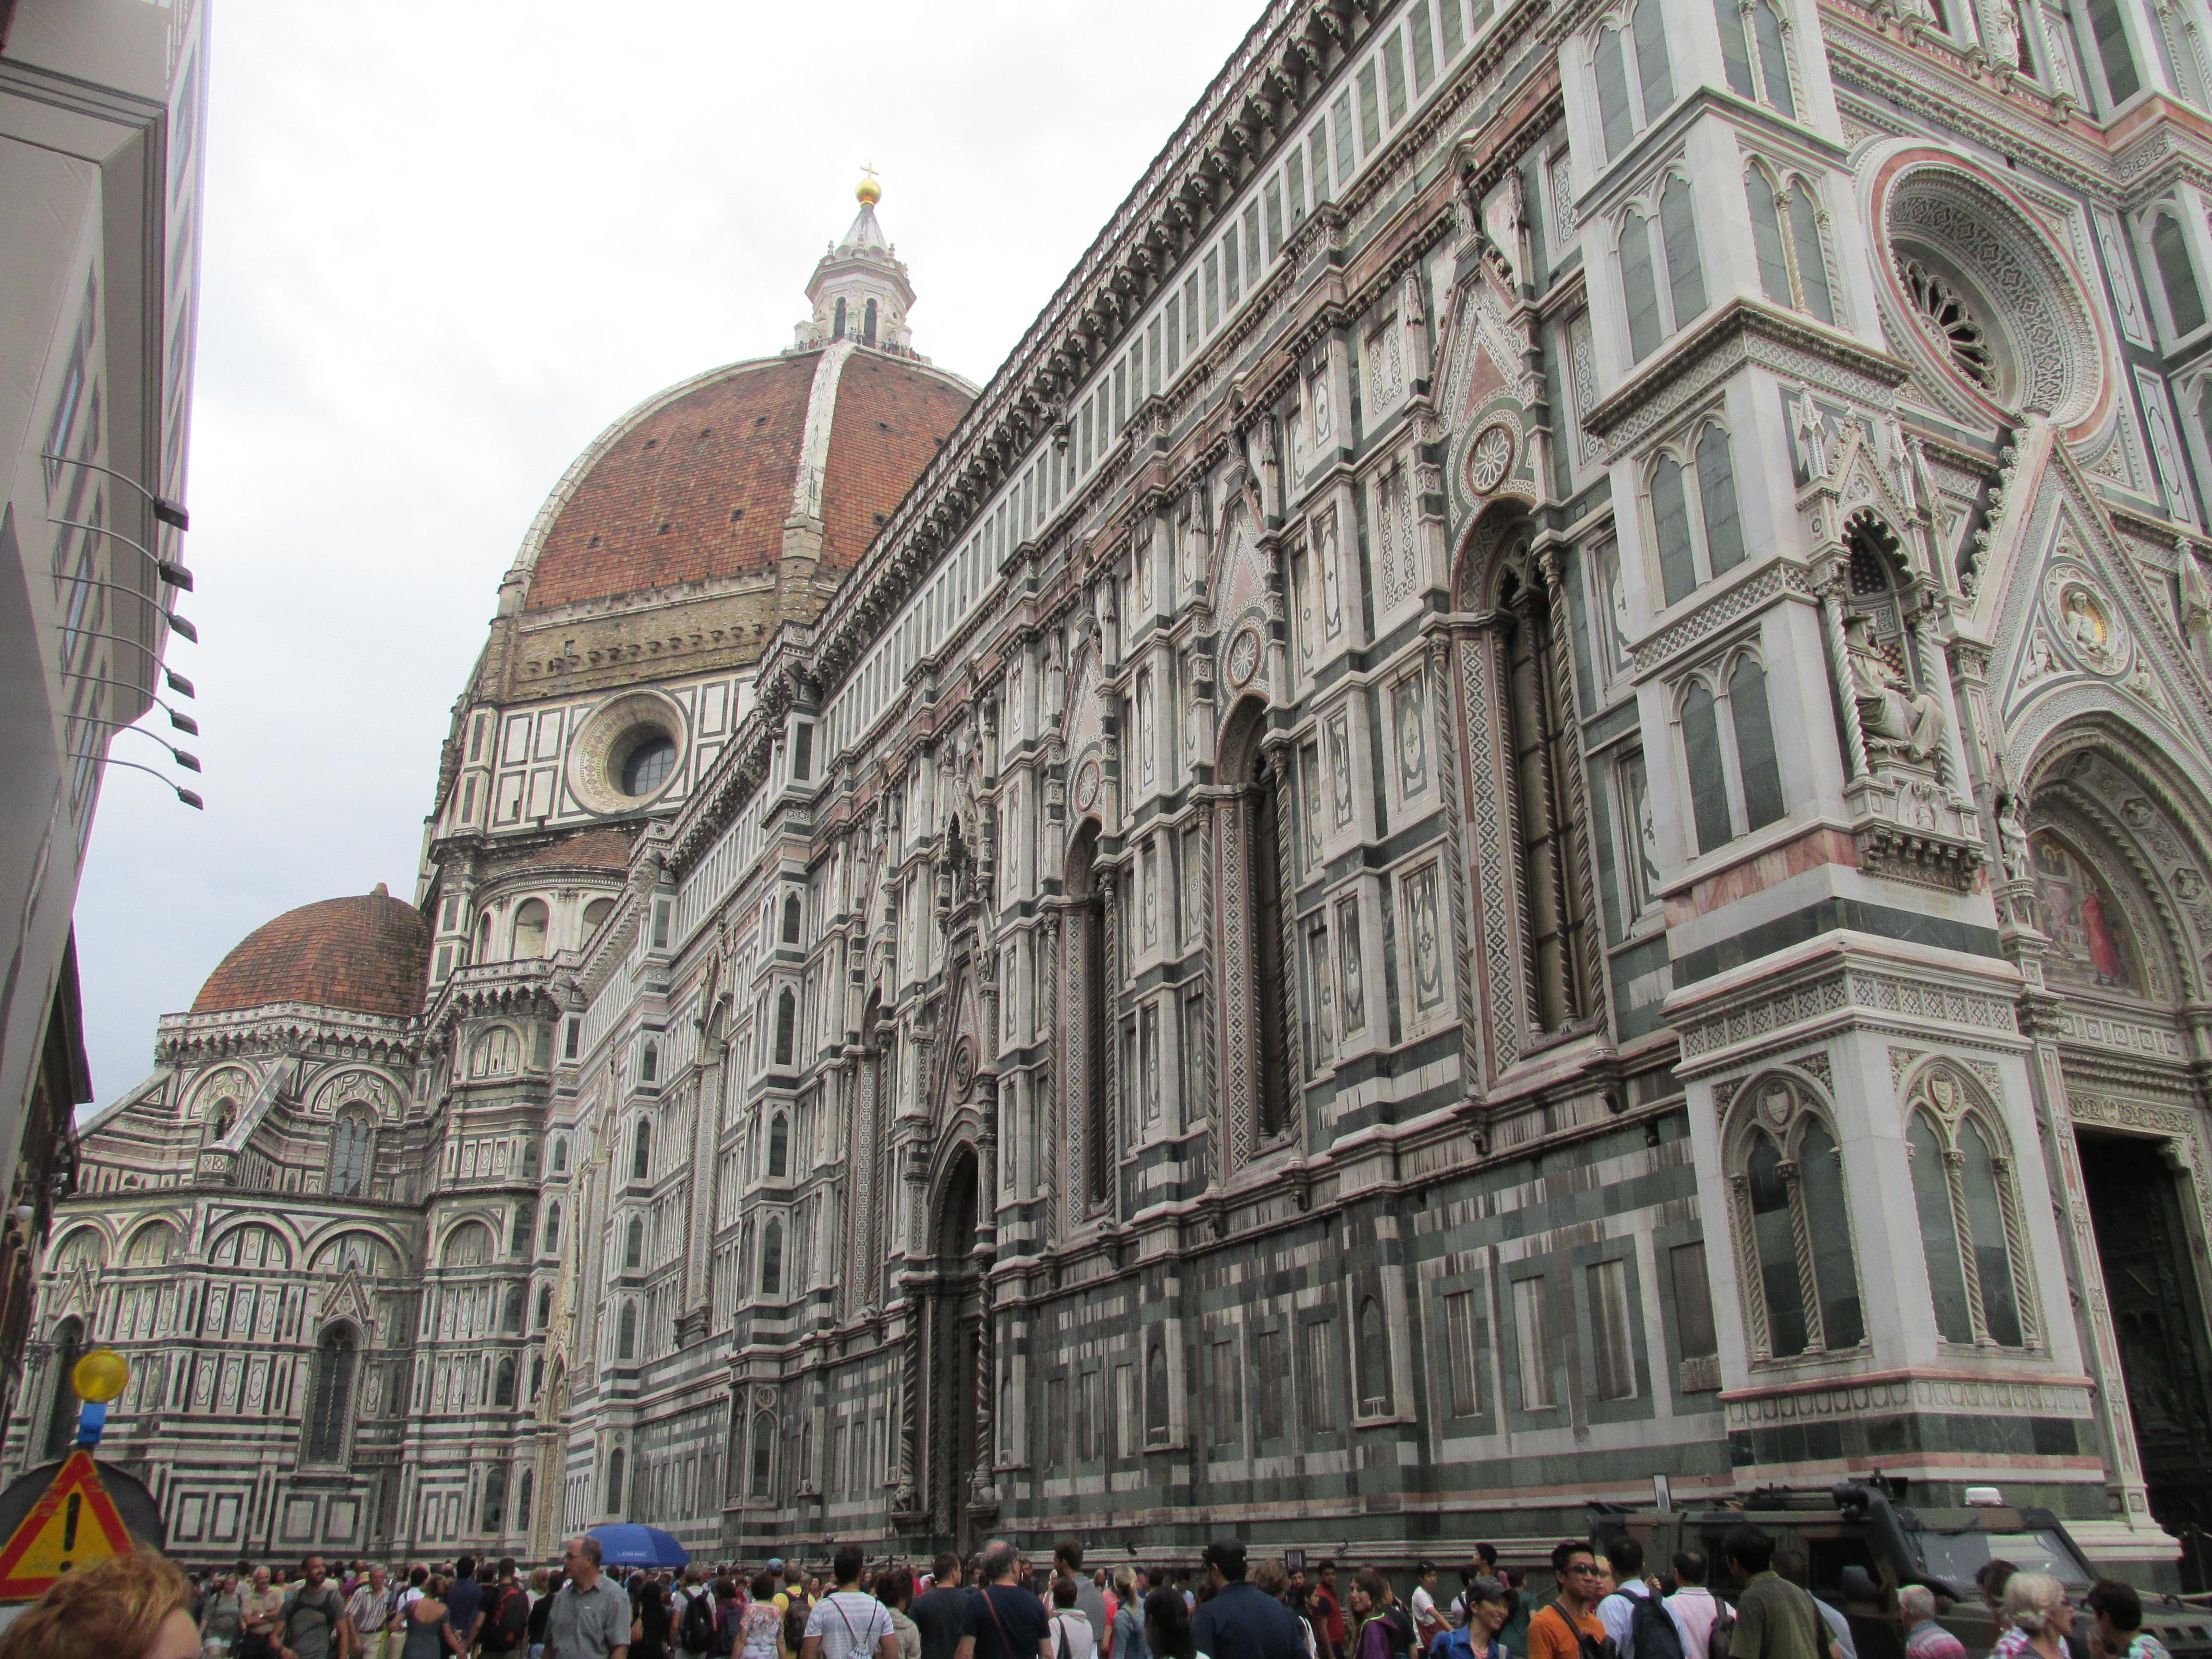 img 2864 - Visitando la Catedral Santa Maria del Fiore de Florencia I/III